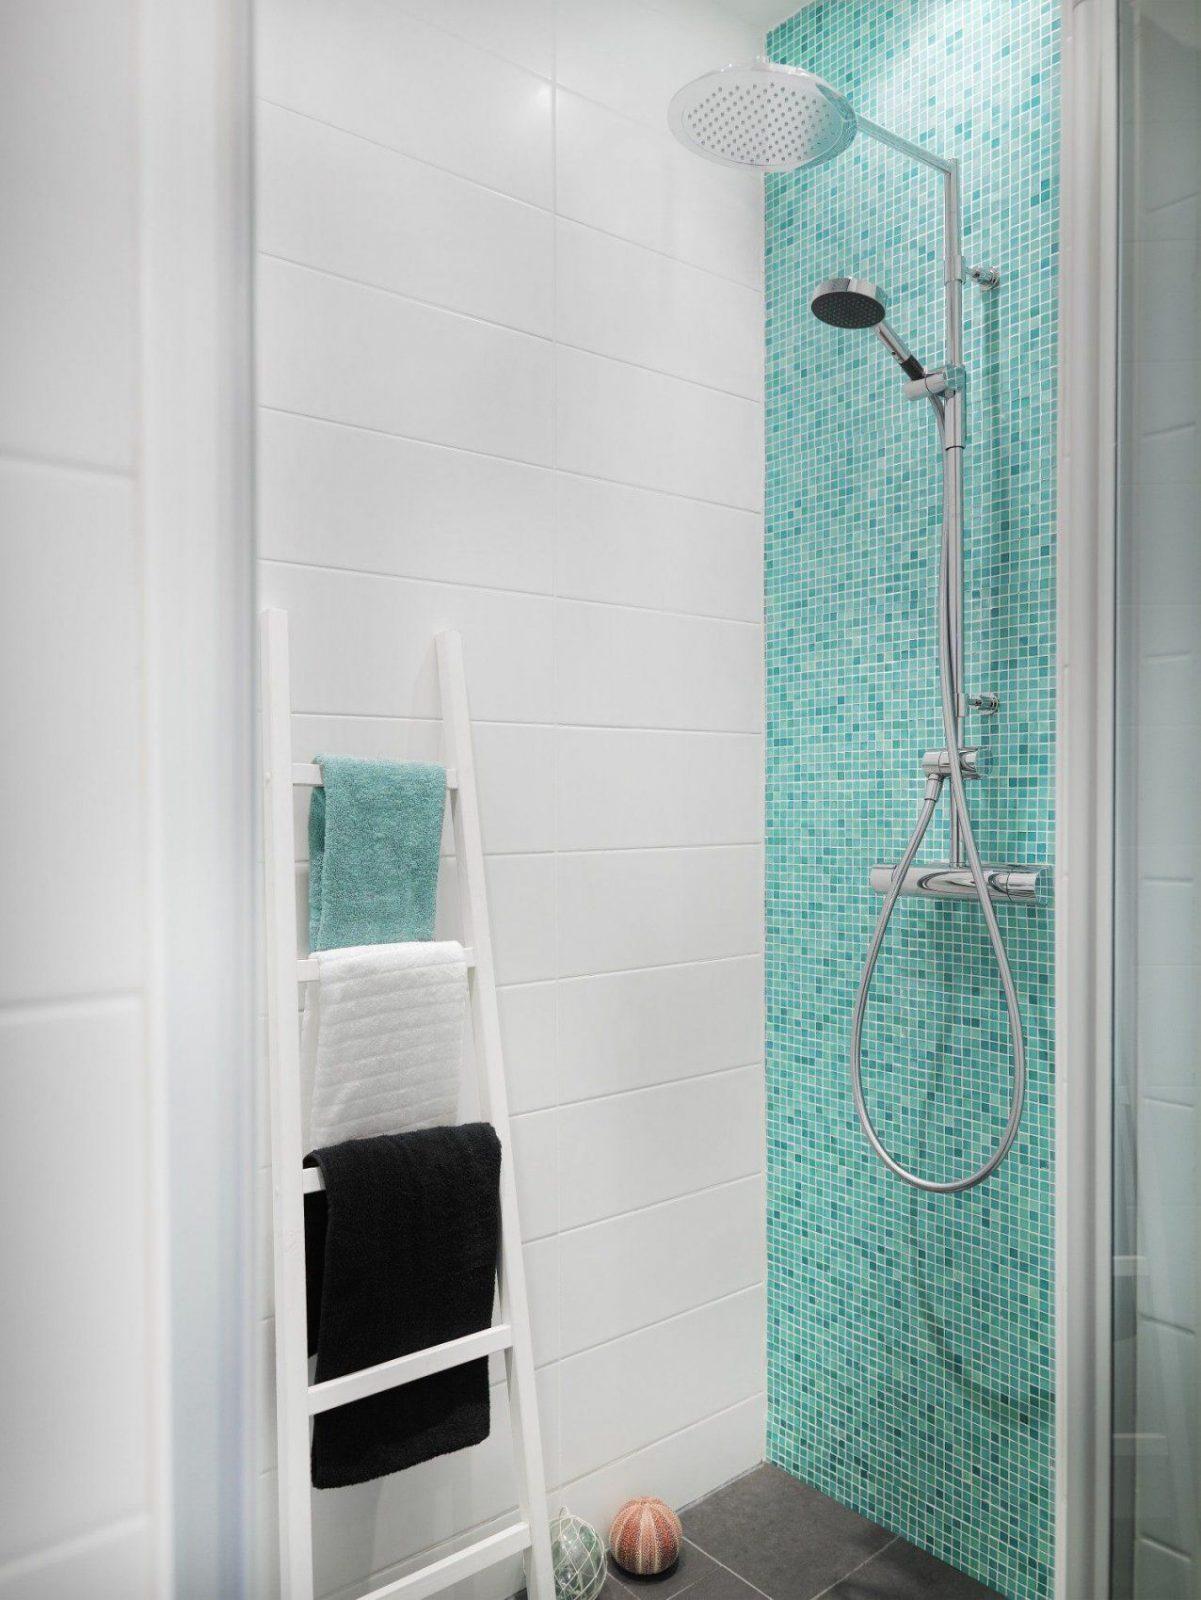 Mosaik Fliesen Bad Turkis Haus Design Ideen